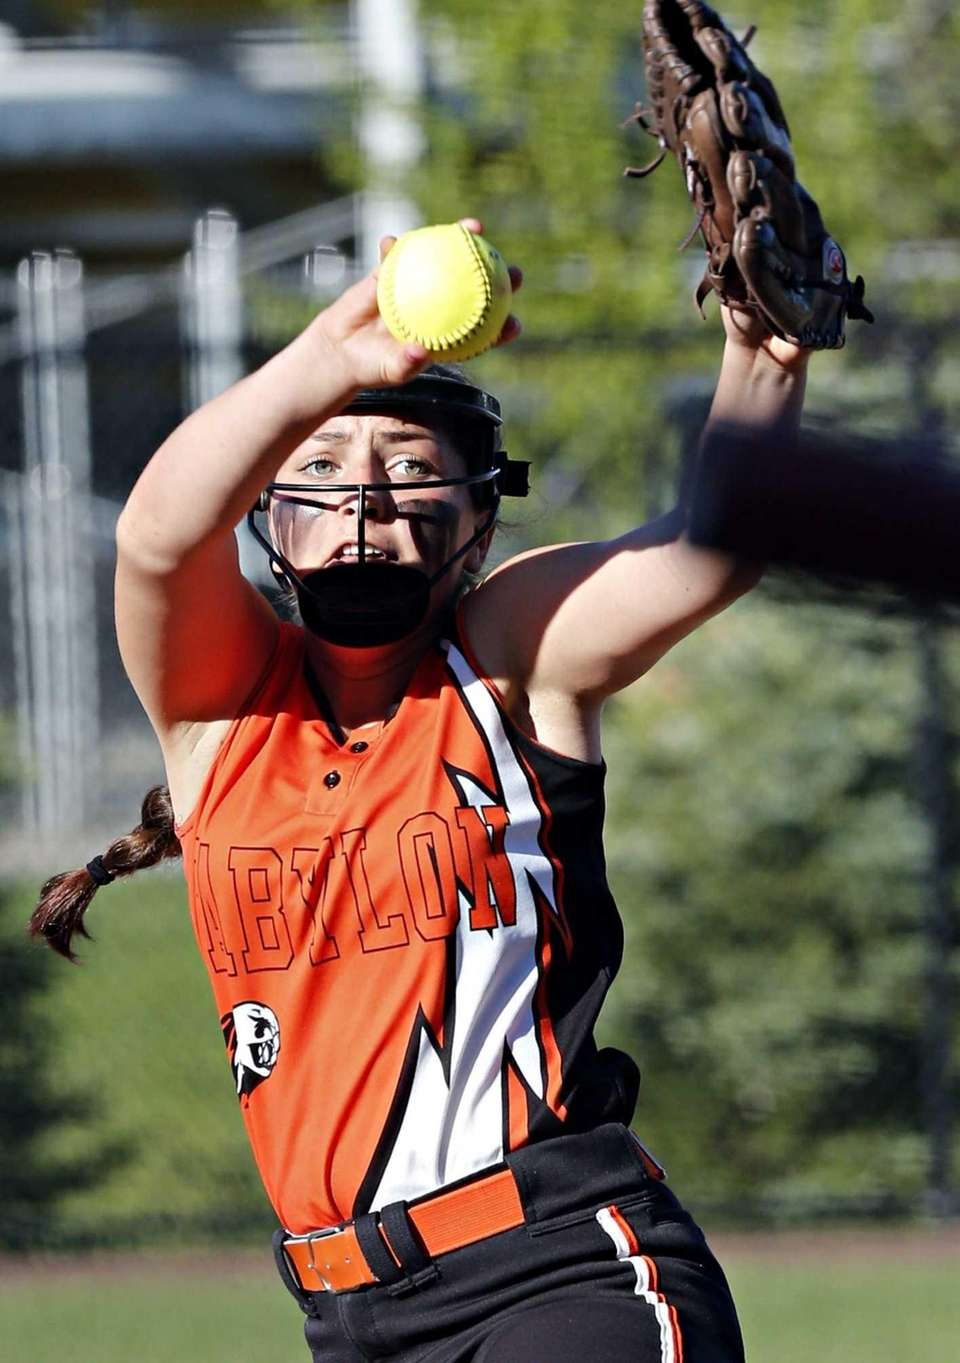 Babylon starting pitcher Alyssa Sasuk delivers a pitch